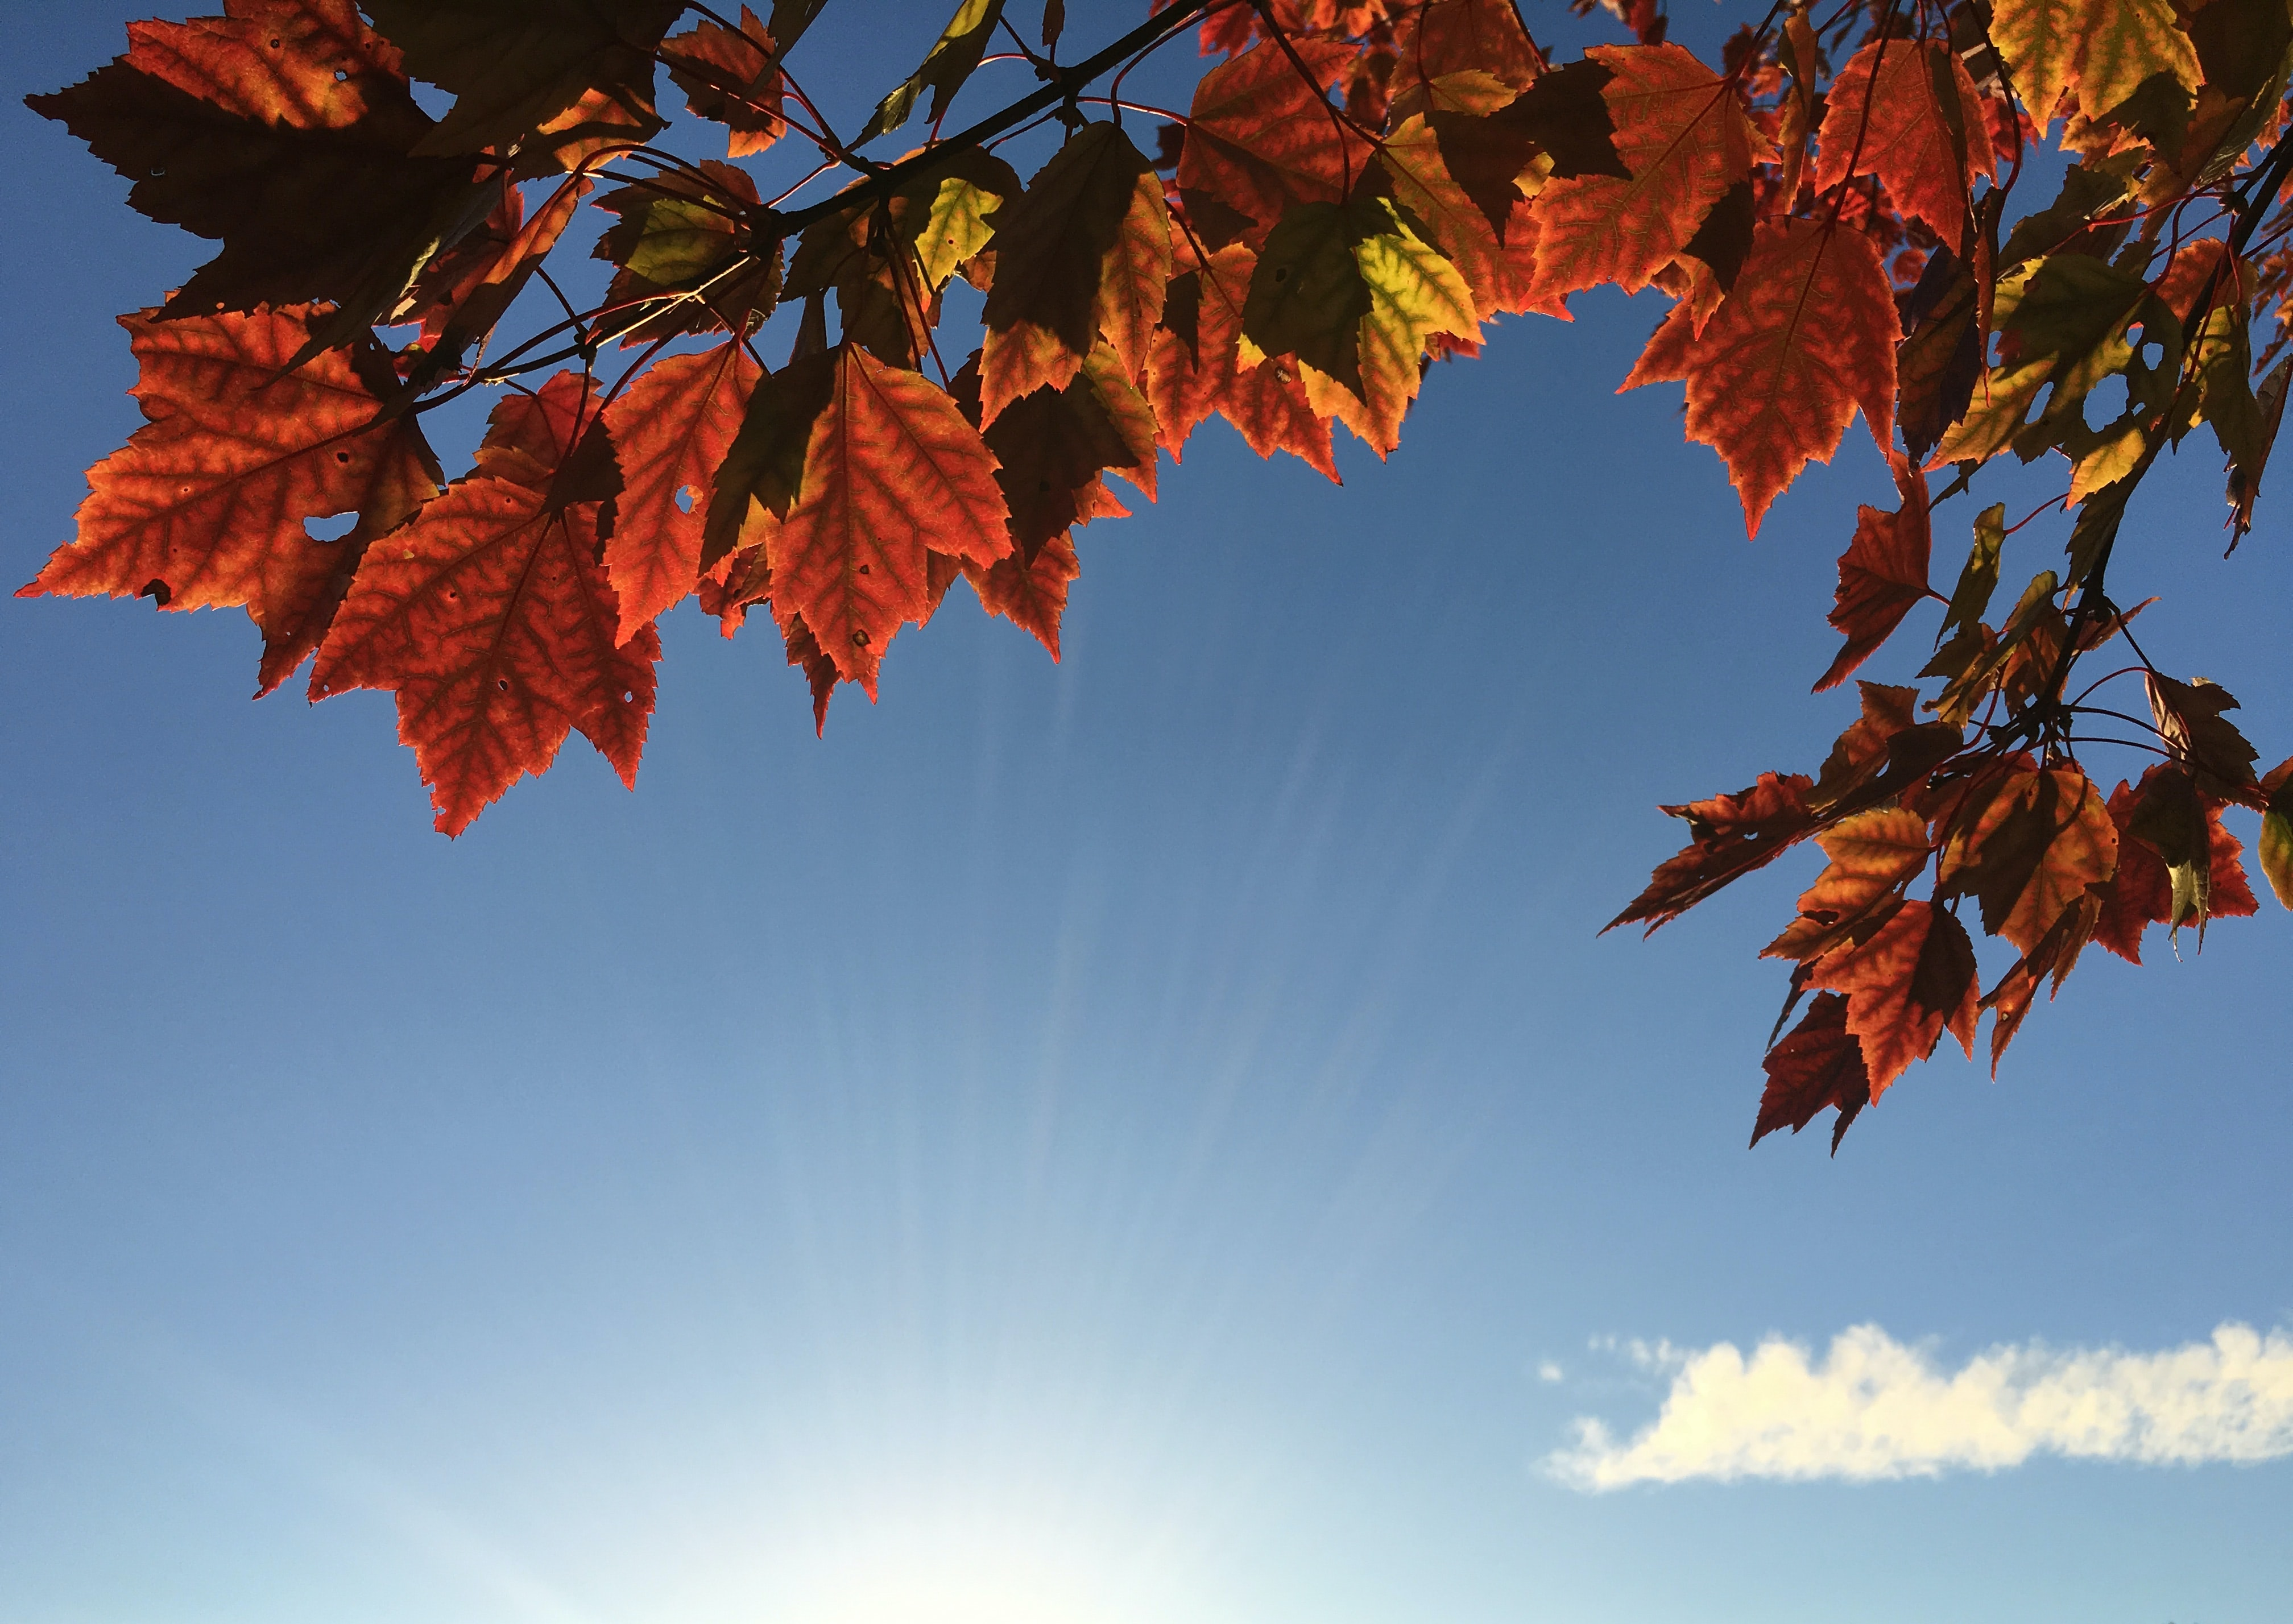 orange maple leaves during daytime